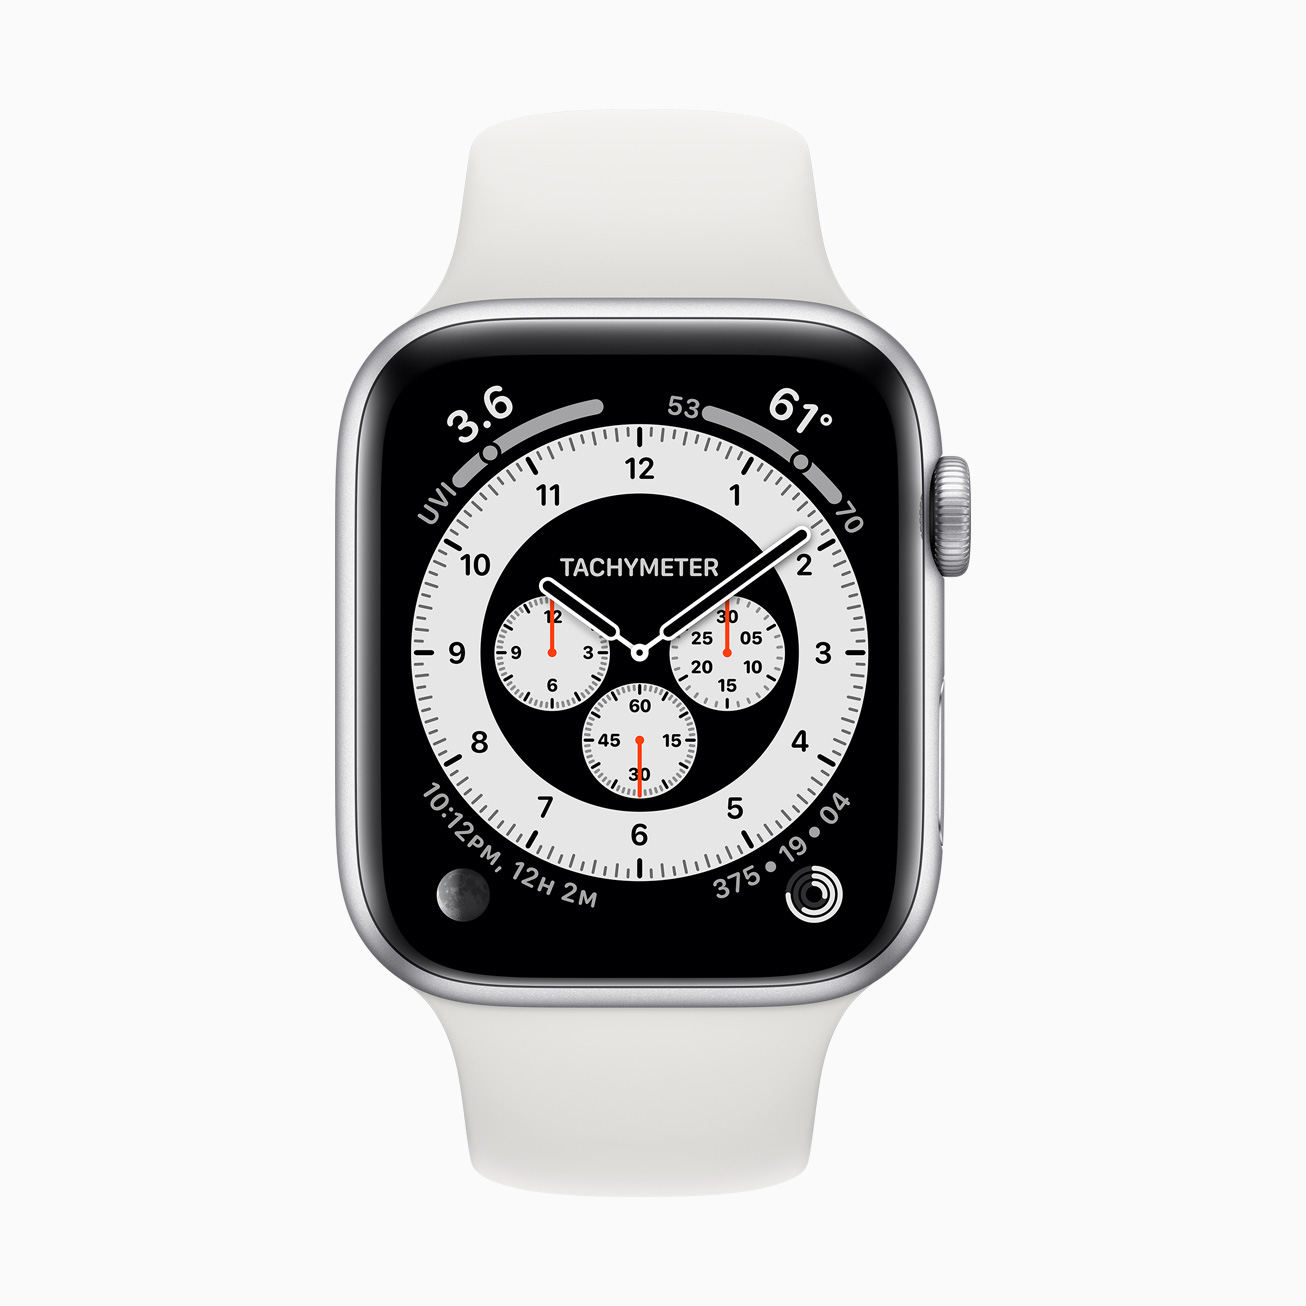 watchOS 7 加入 Apple Watch 錶盤共享、睡眠追蹤和洗手檢測